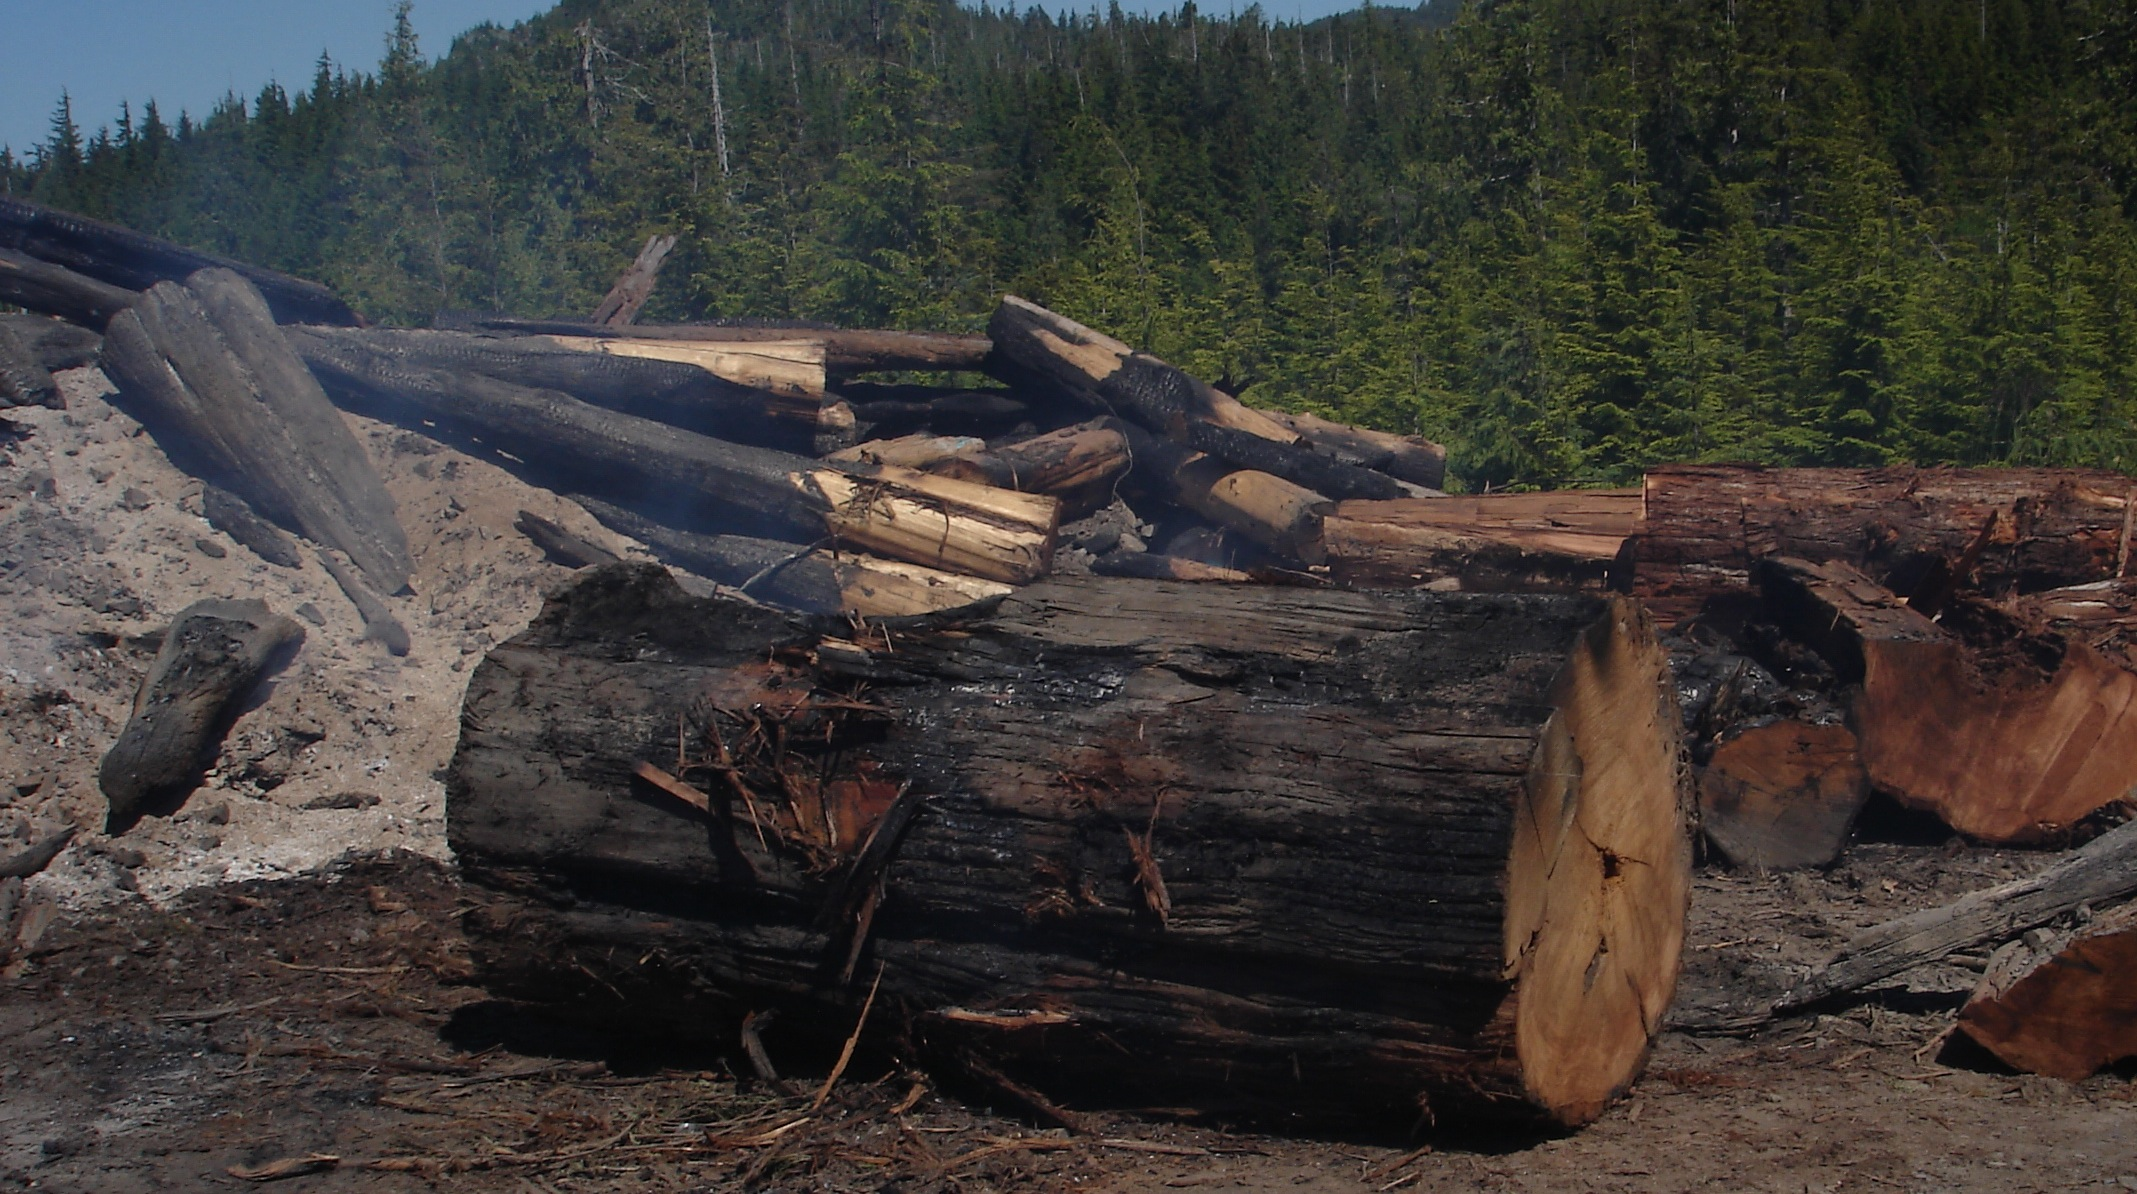 Wasting Wood